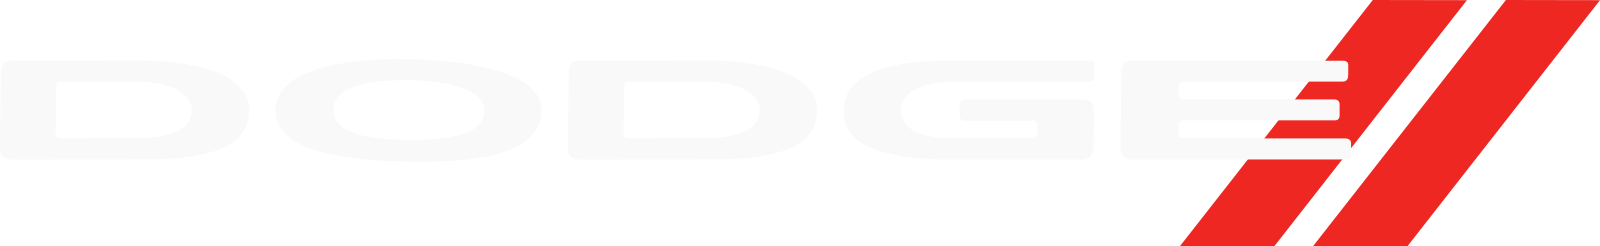 dodge logo 3 - Dodge Logo